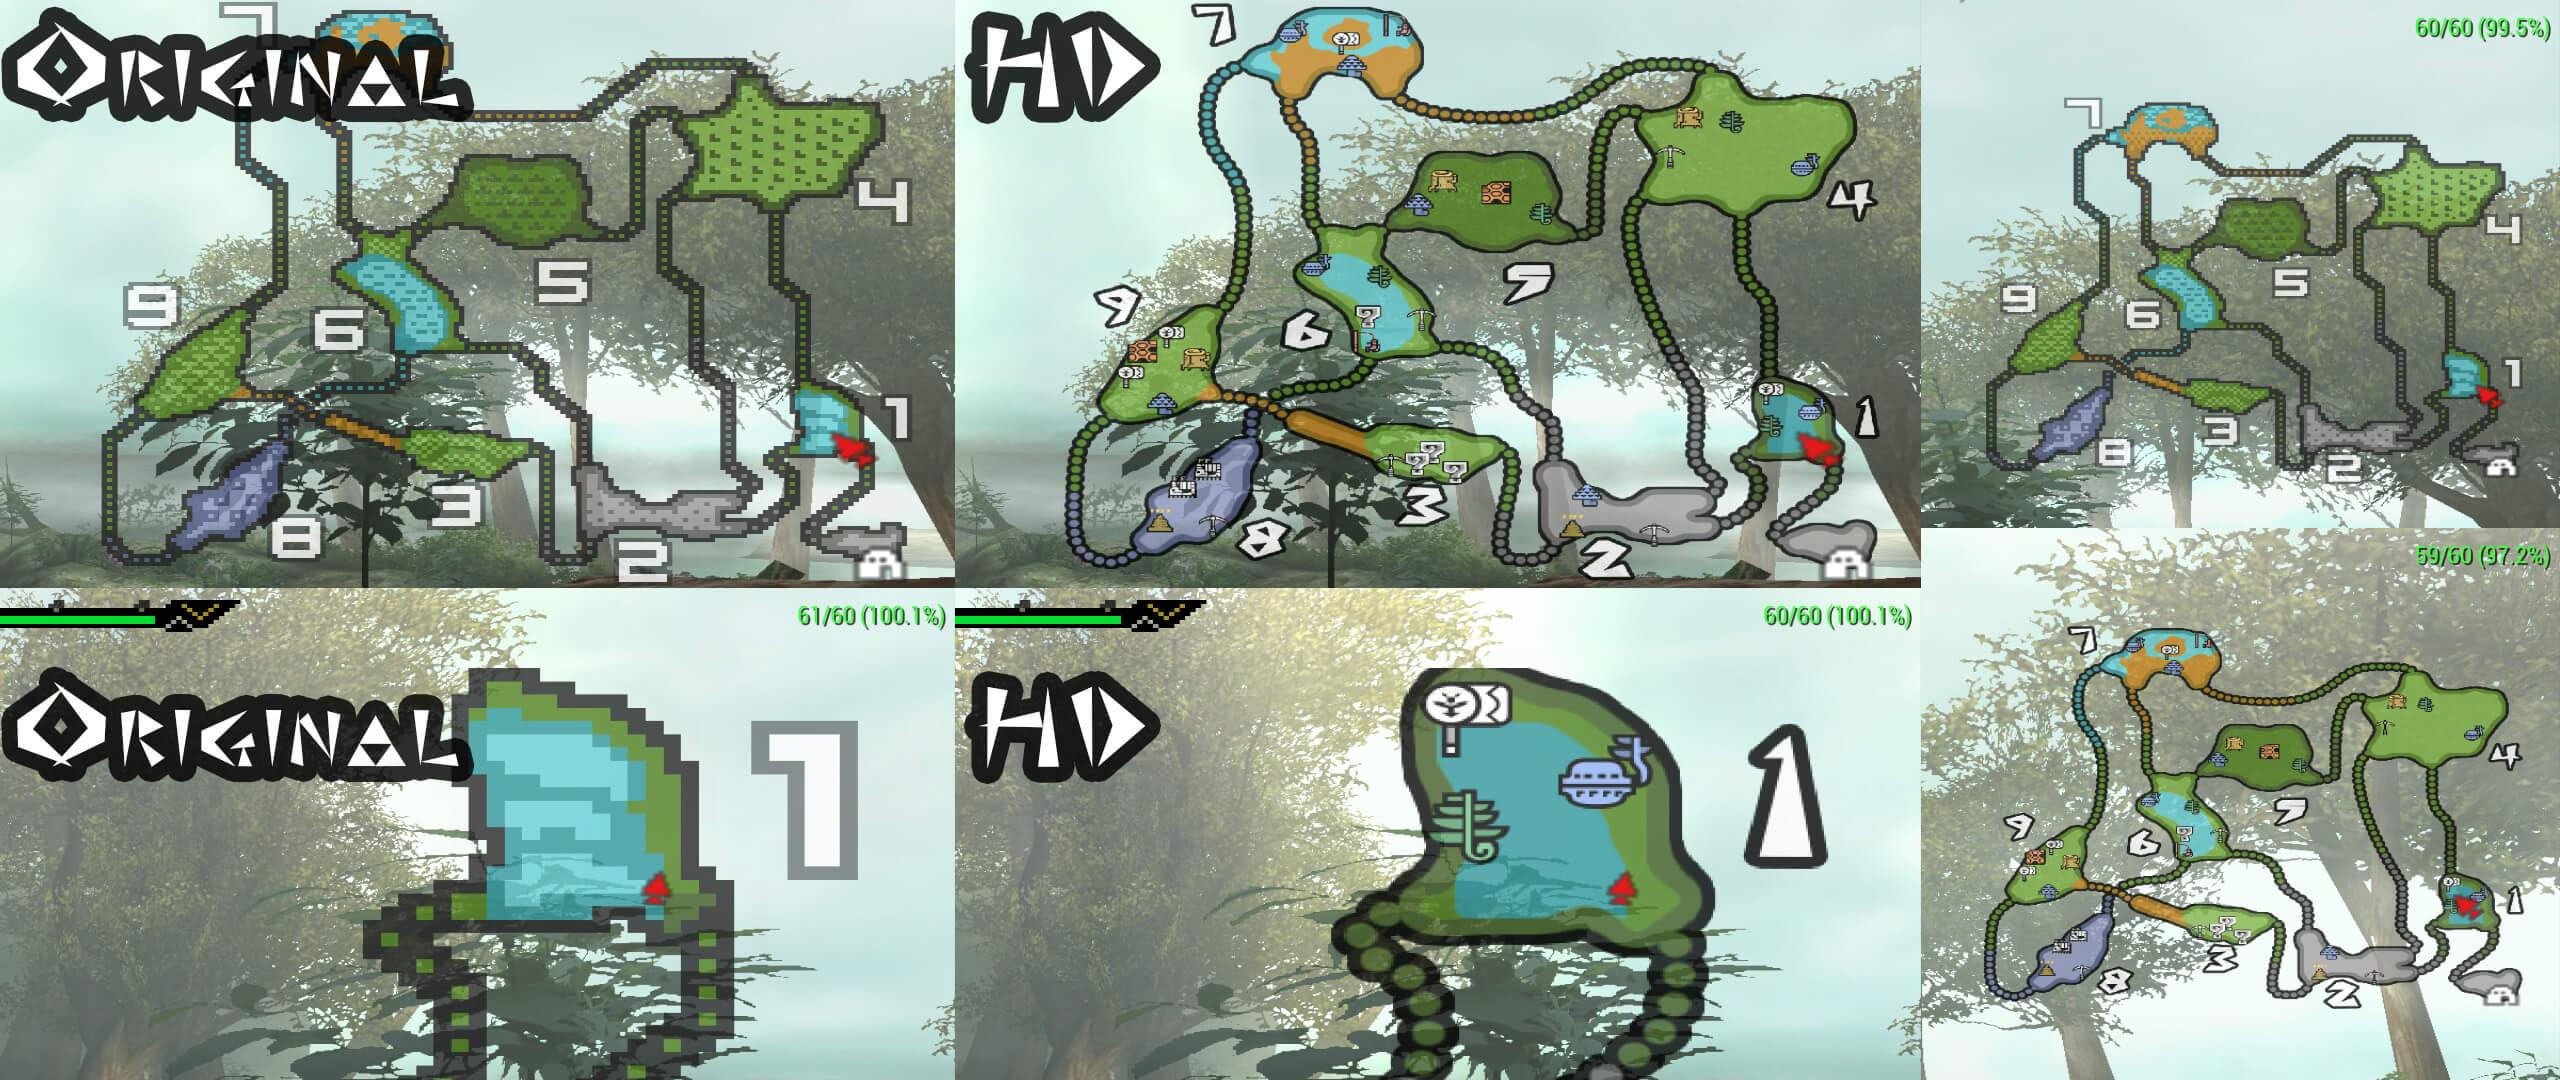 Monster Hunter Portable 3rd HD - HD Textures